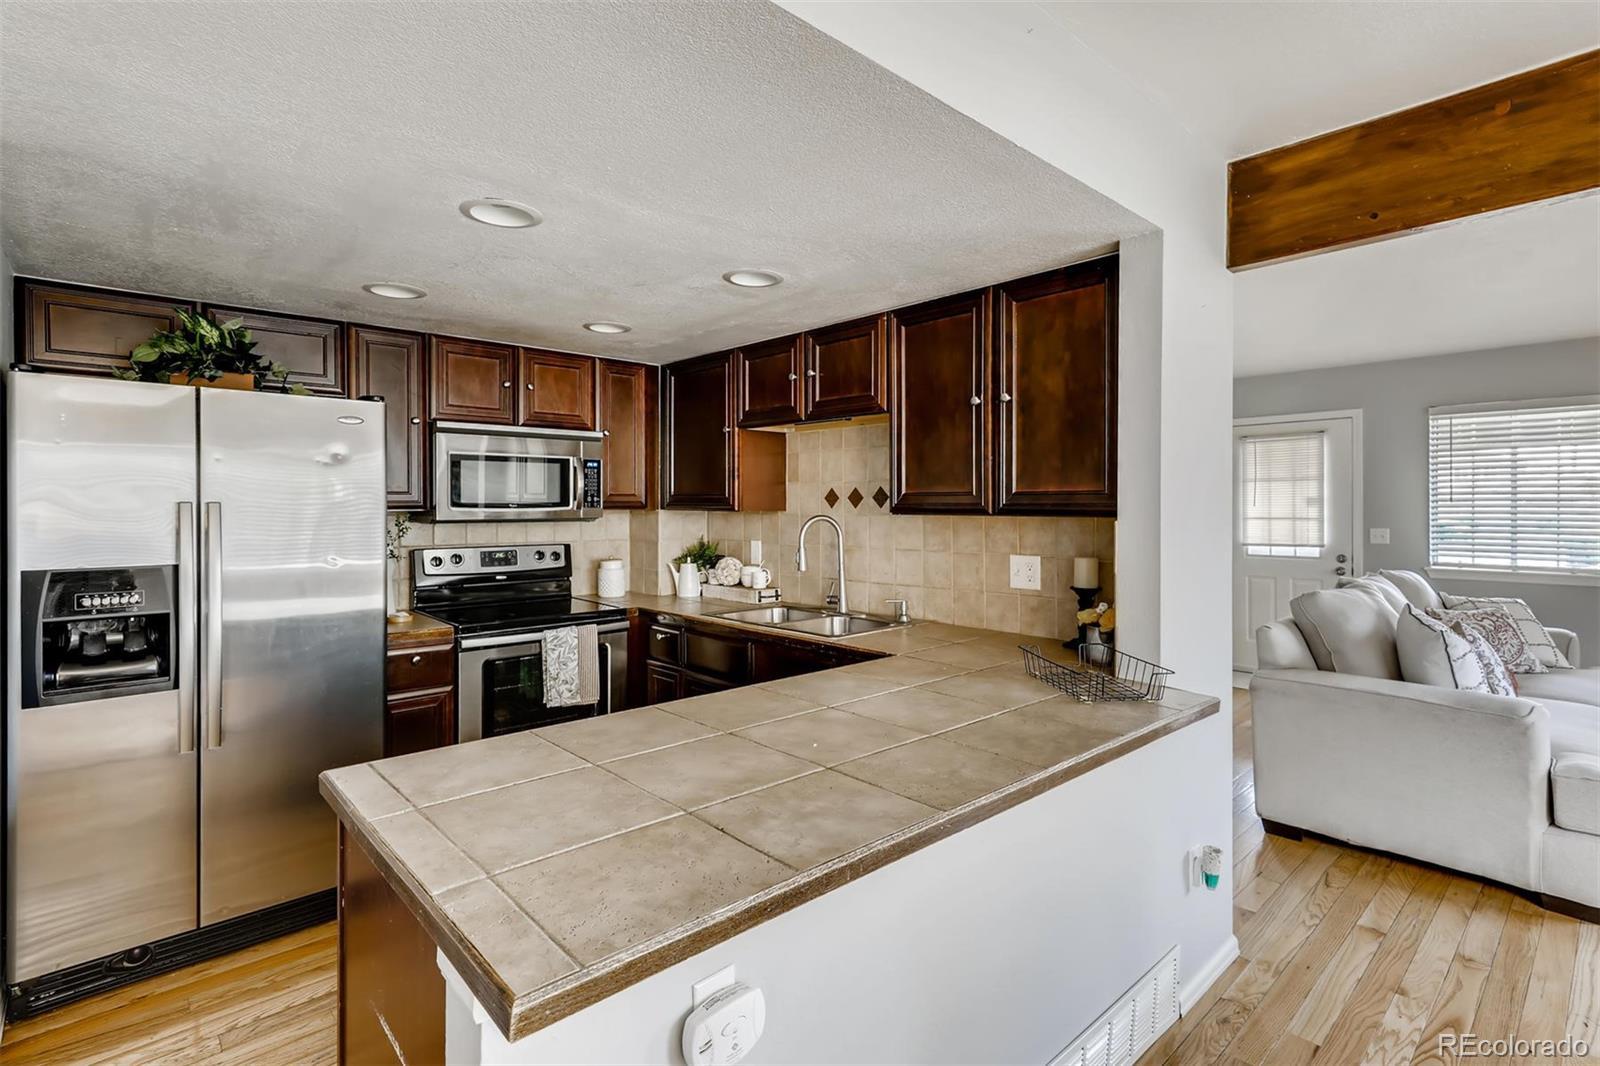 MLS# 7445656 - 10 - 1710 W 101st Avenue, Thornton, CO 80260